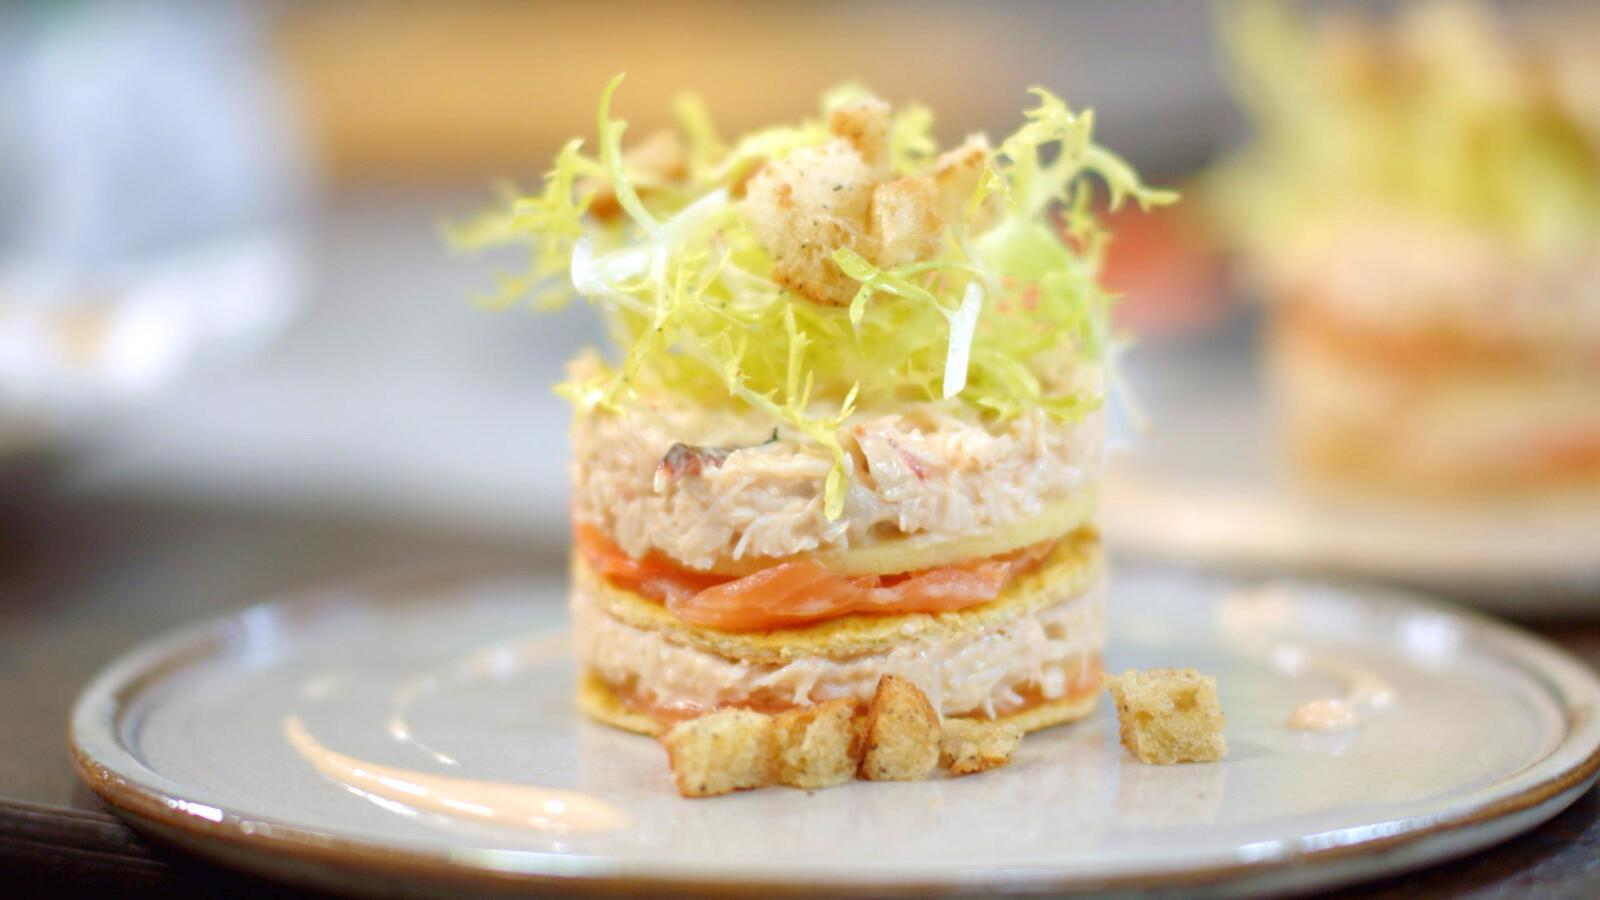 Torentje van omelet, krabsla, appel en gerookte zalm